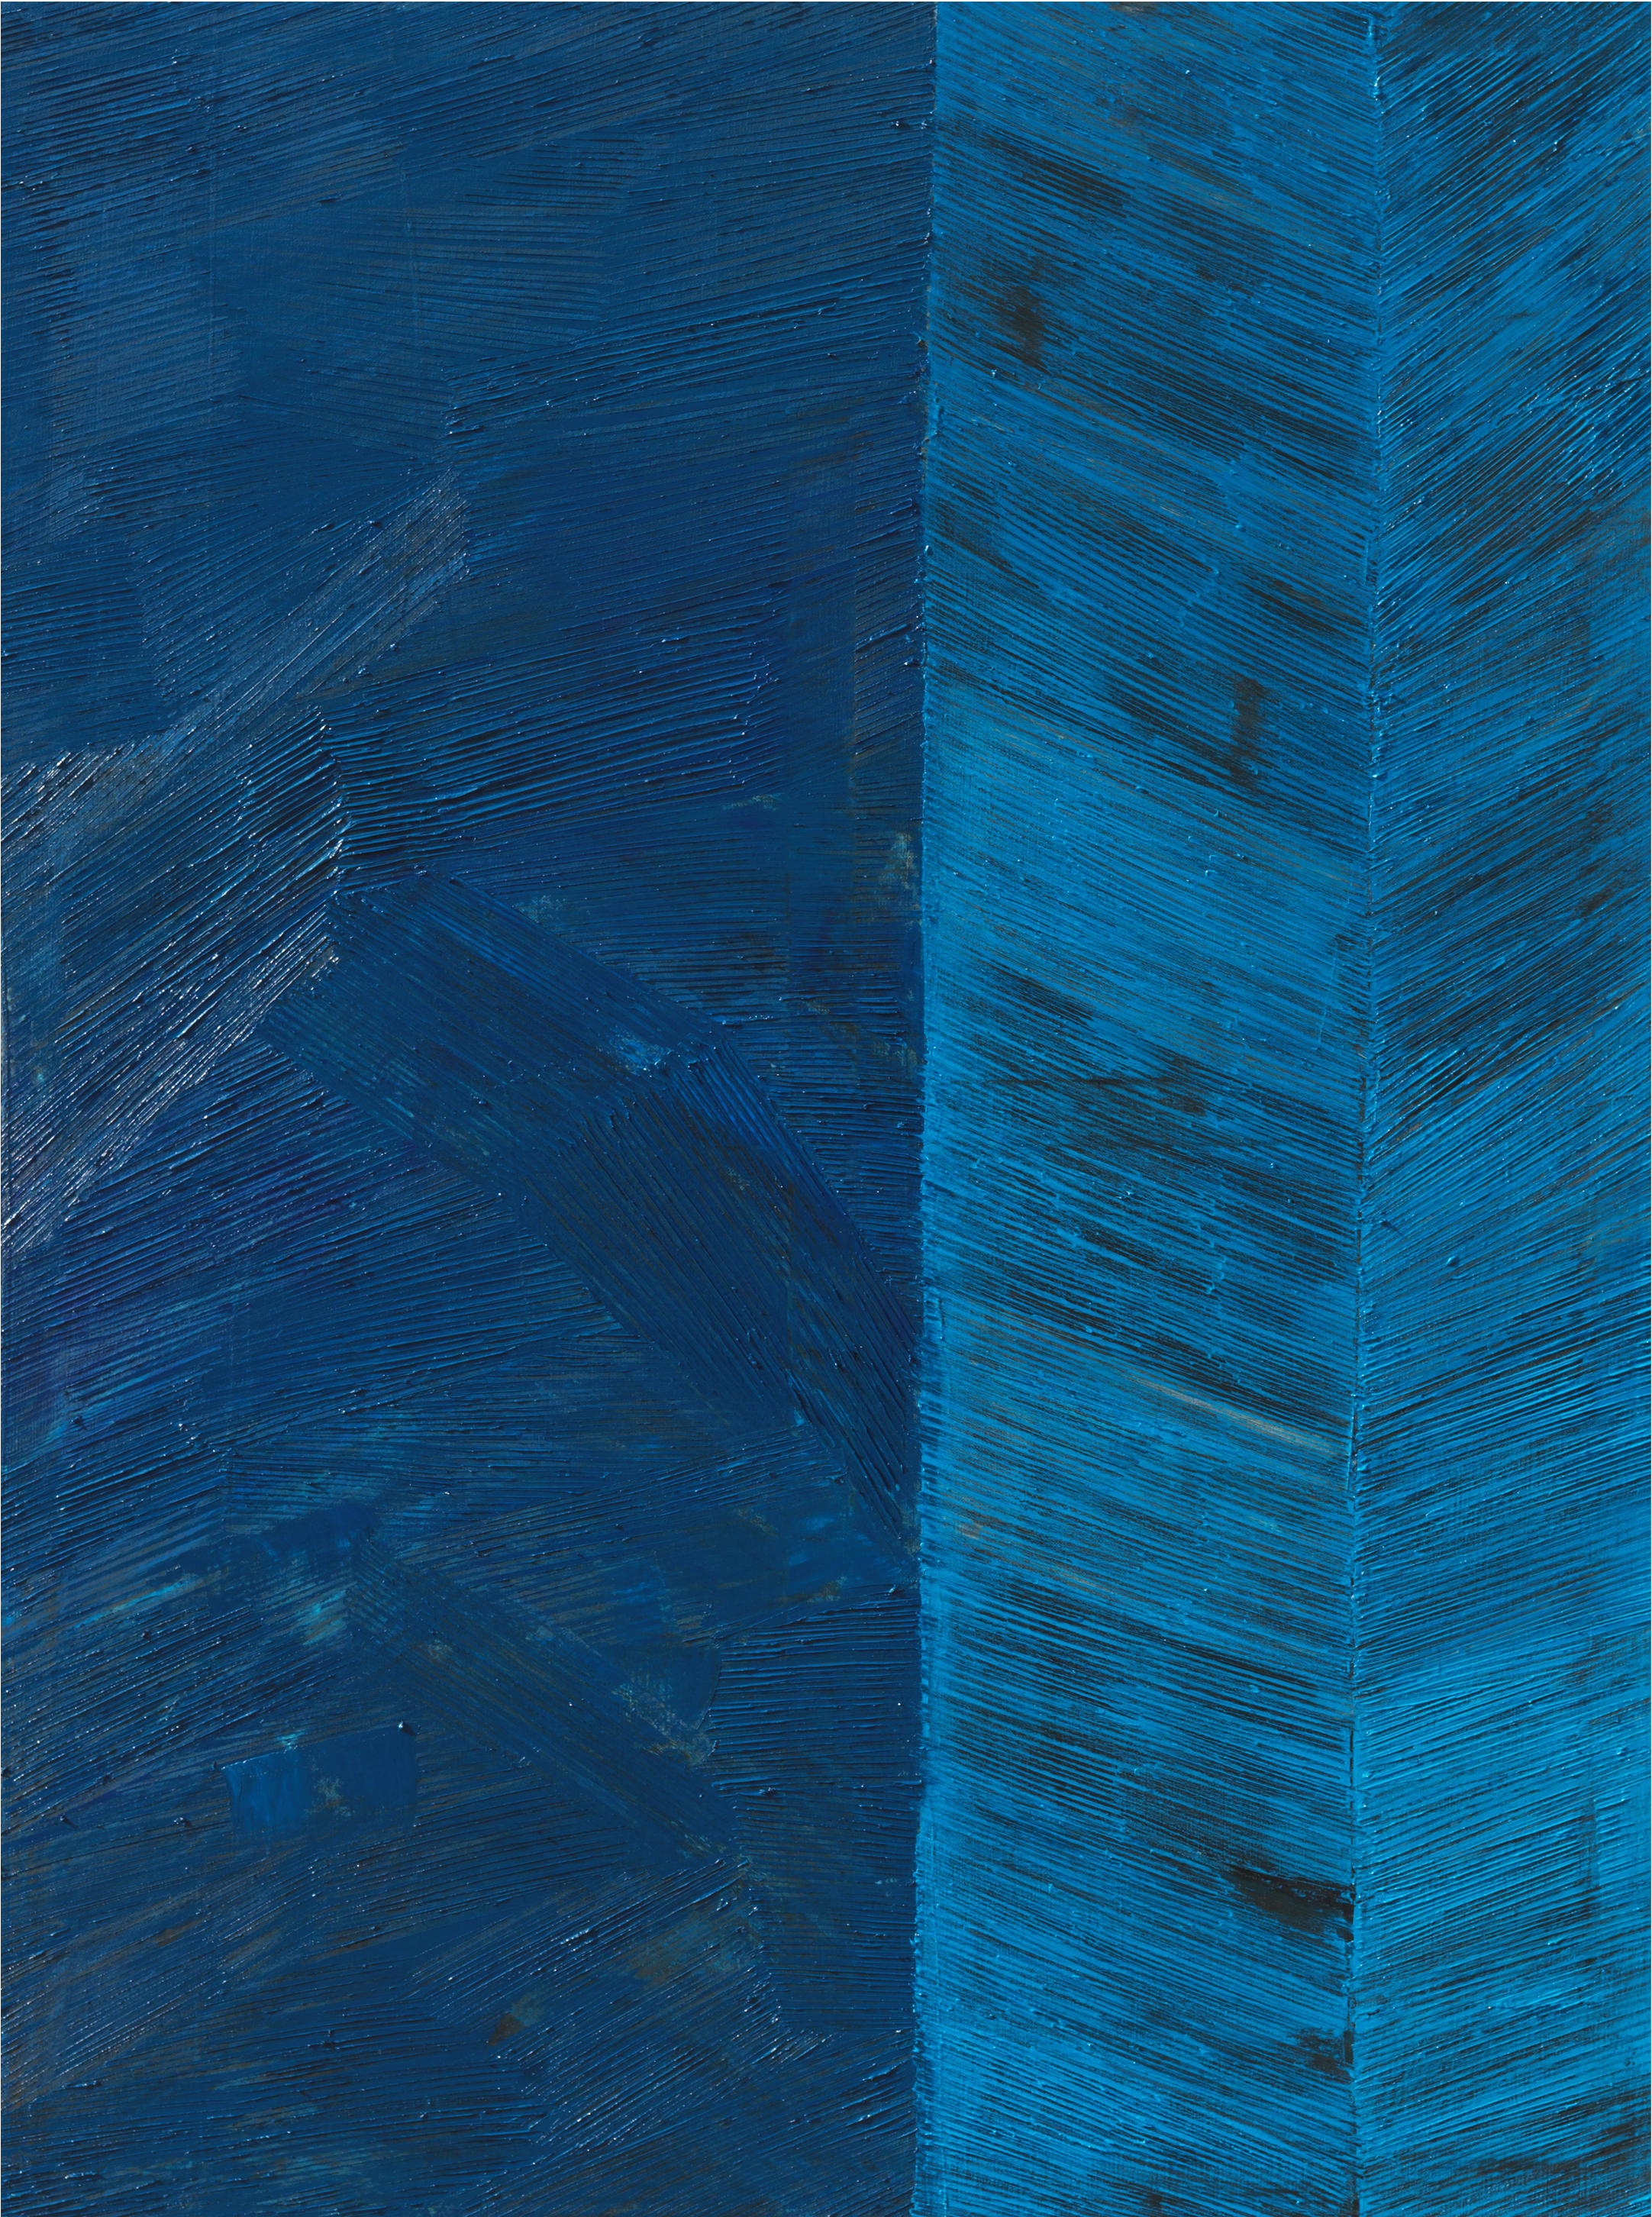 Palimpsest (Blue II)